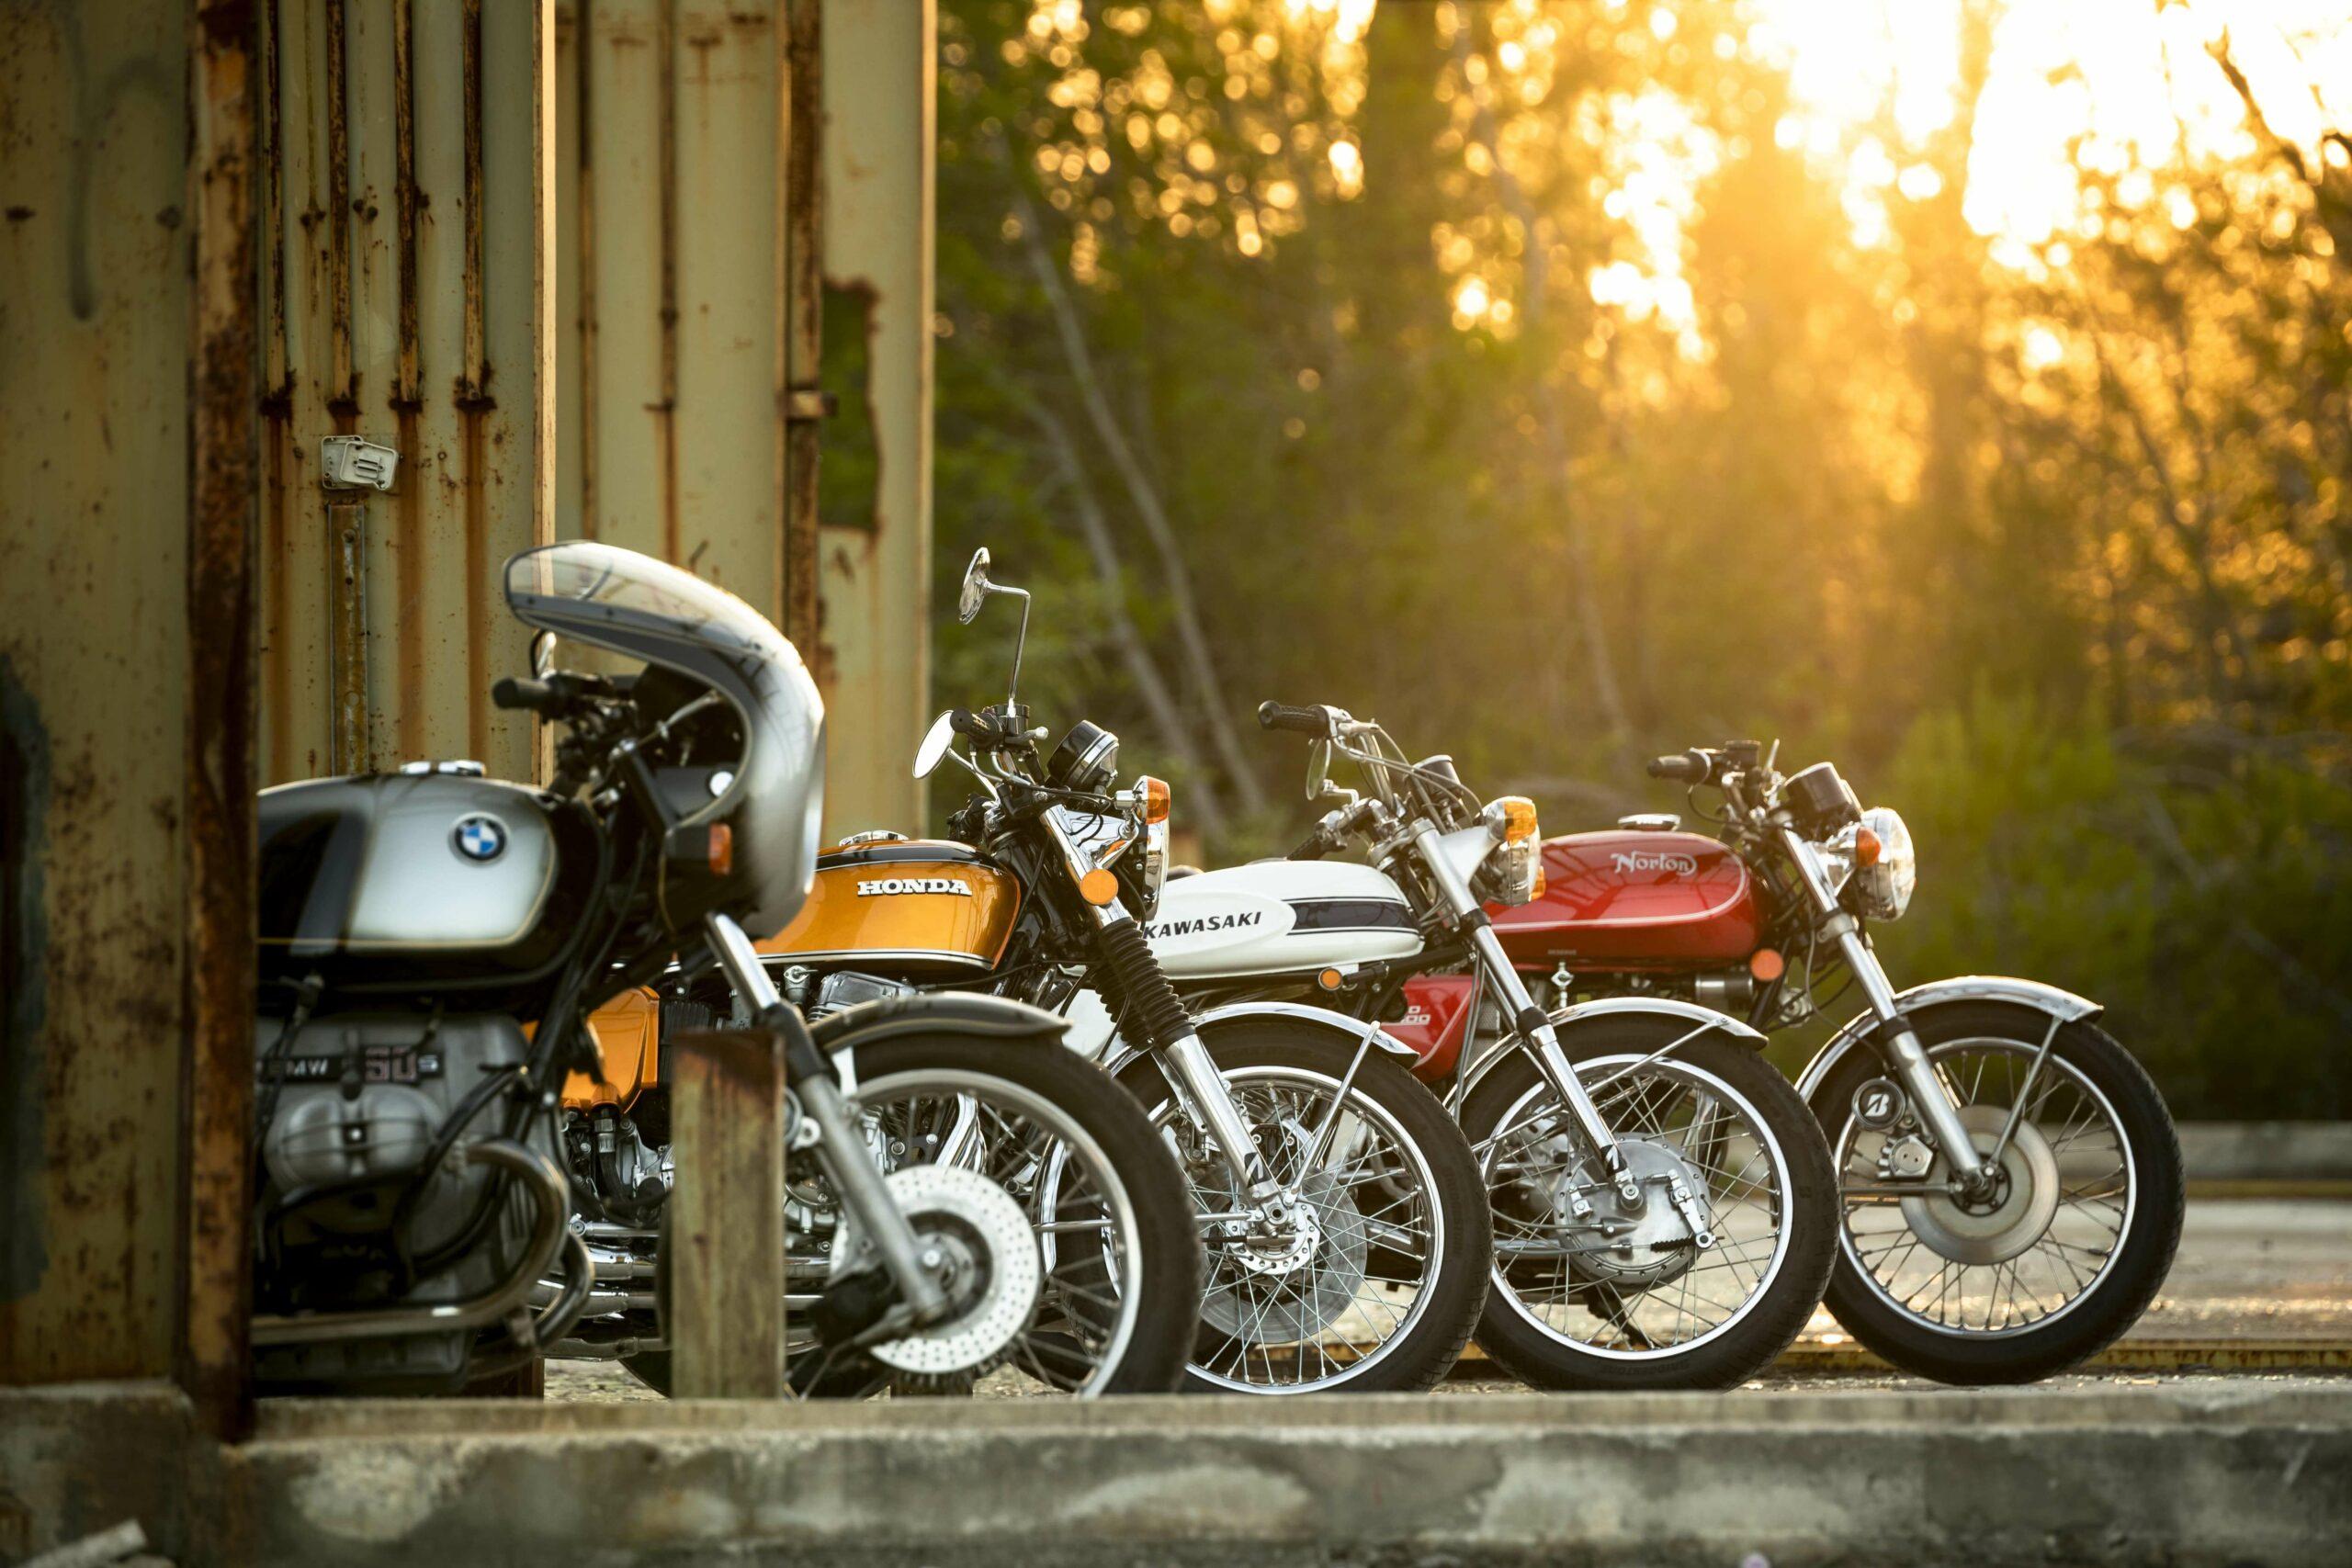 Classic rides: old vs new economy